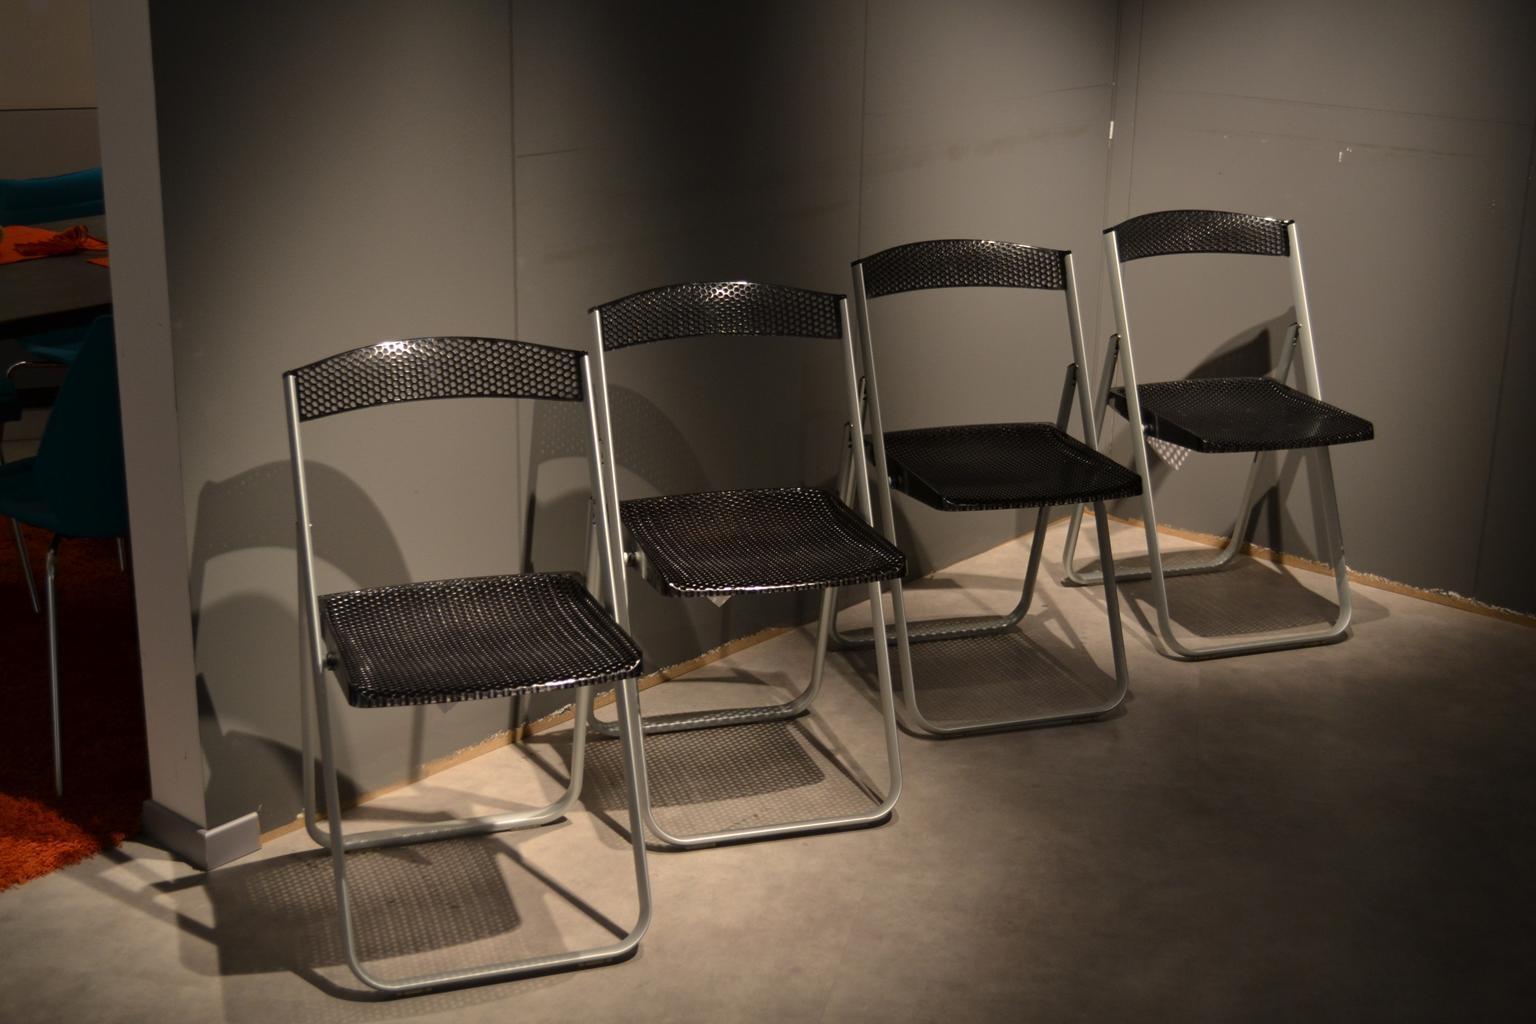 Kartell 4 sedie honeycomb fume 39 sedie a prezzi scontati for Sedie kartell prezzi